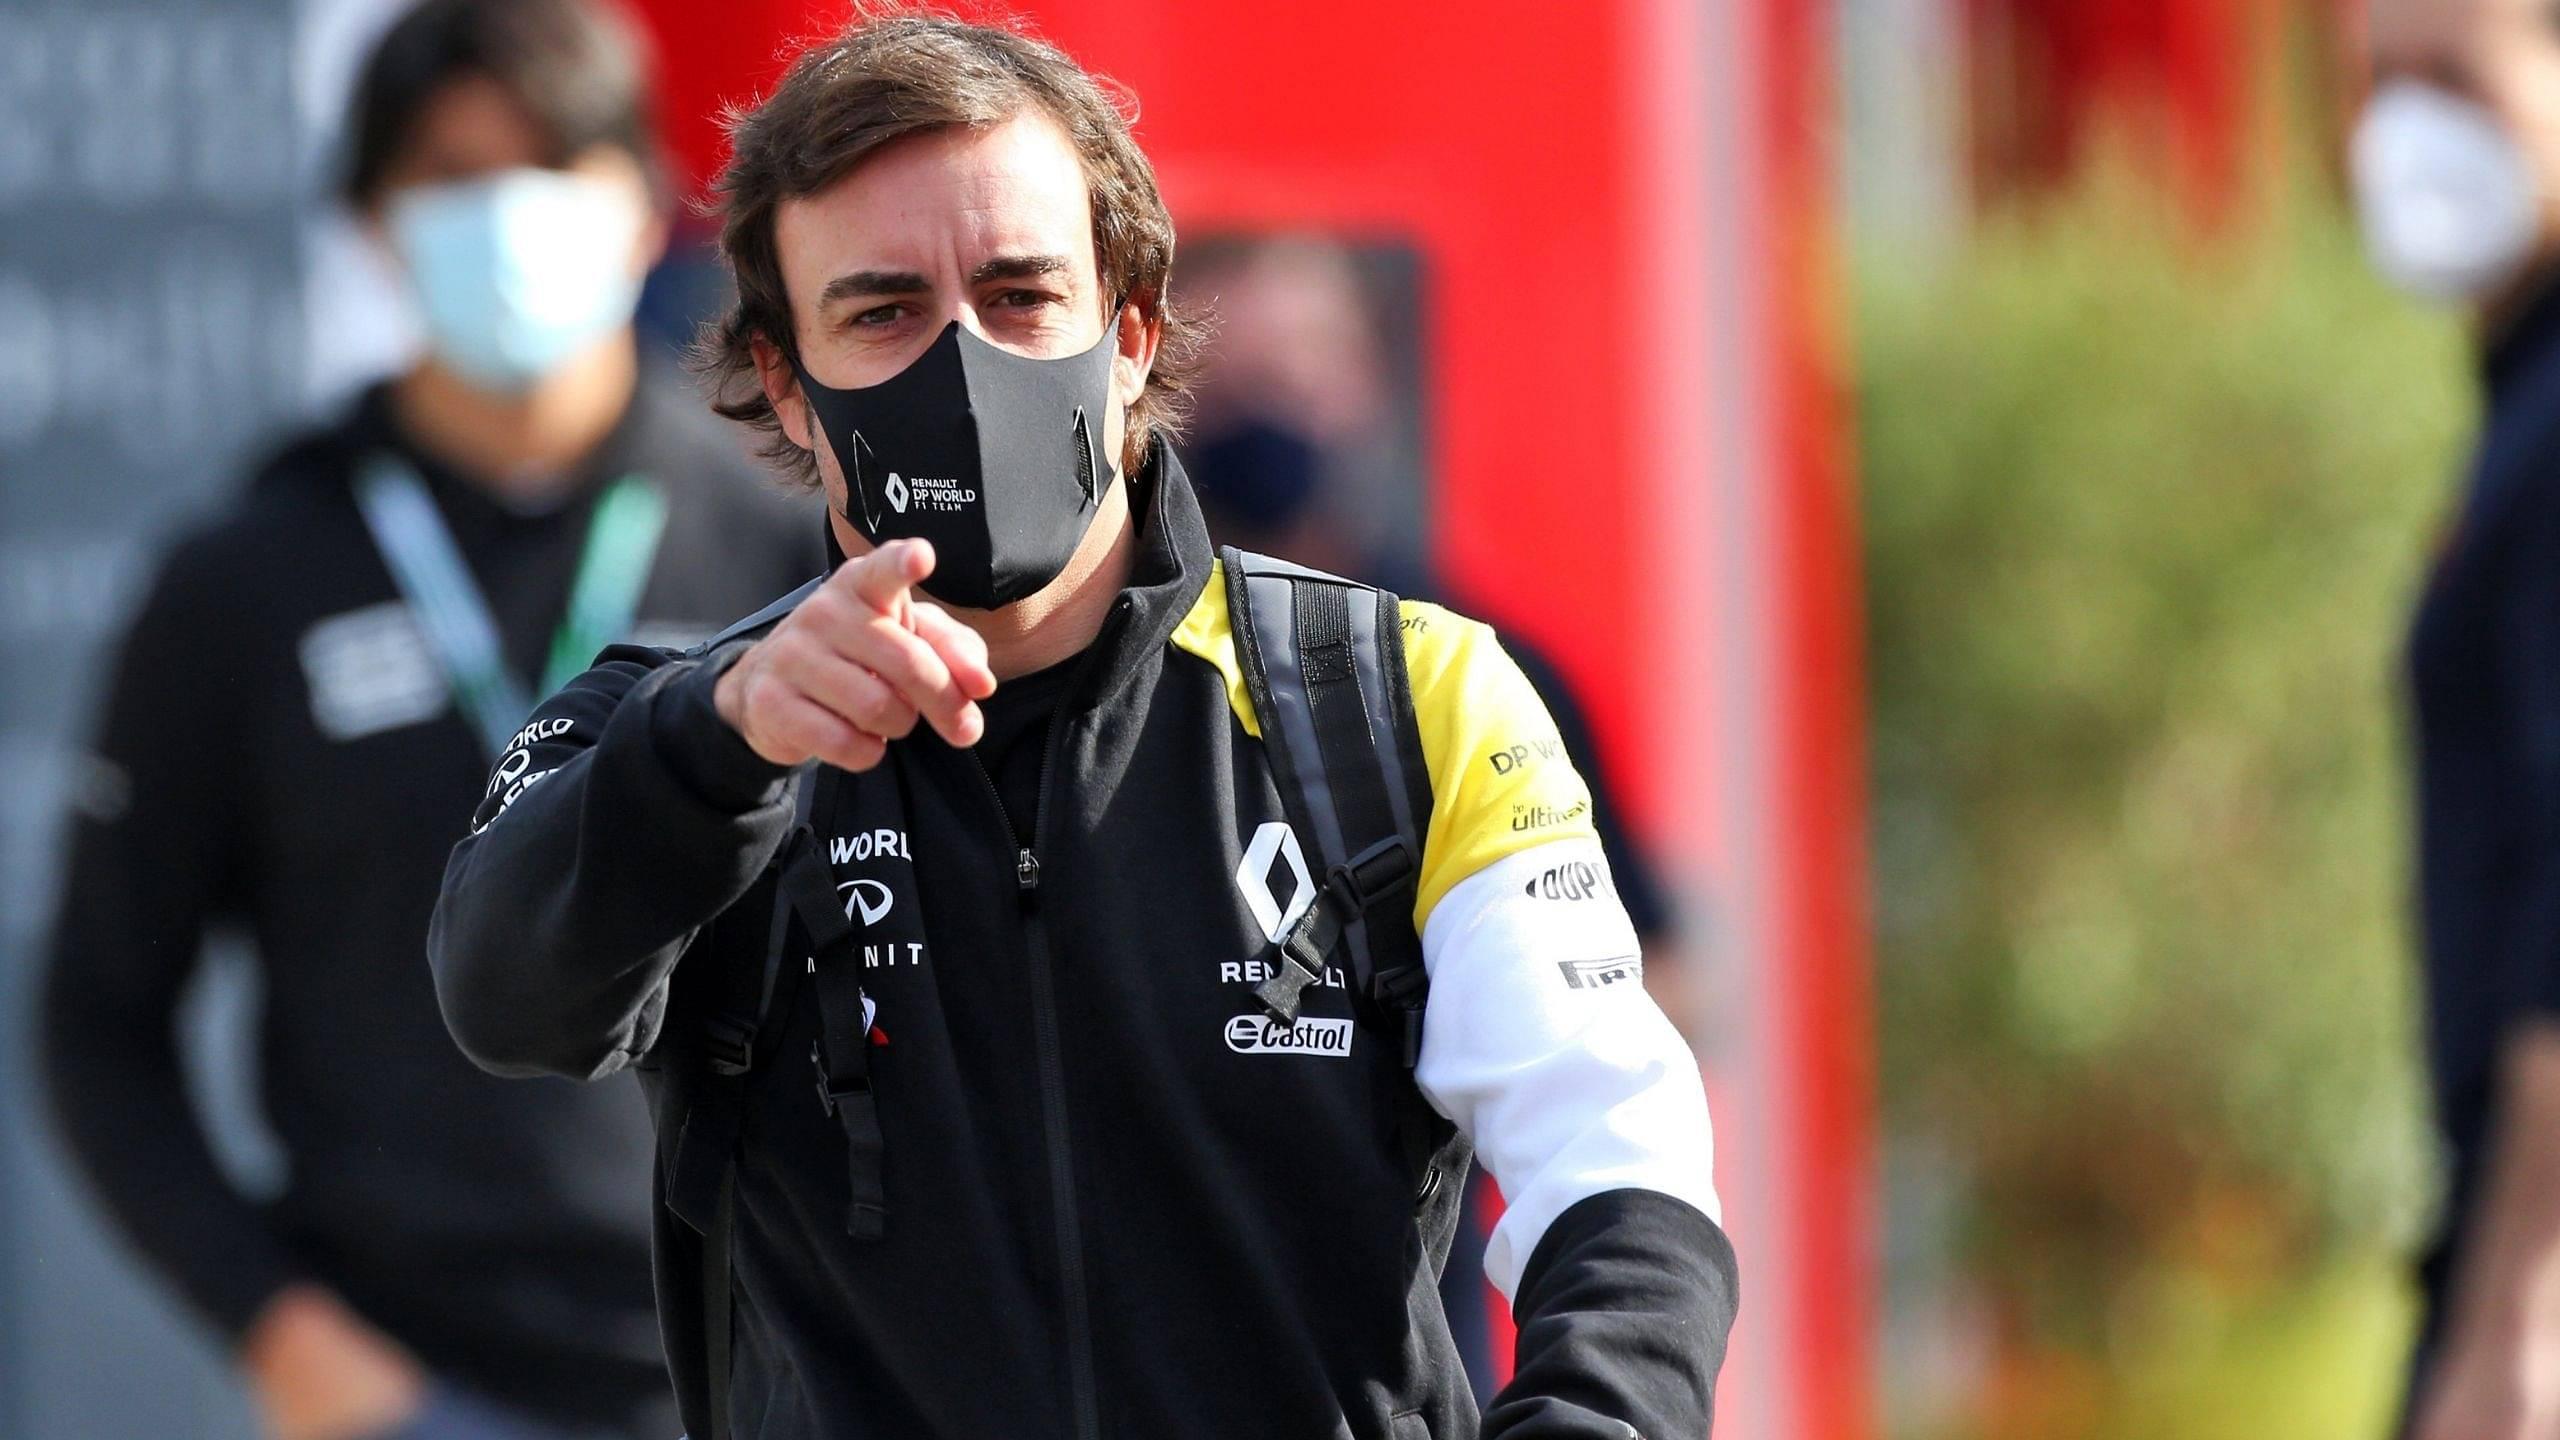 F1 Post-Season Test 2020: Why has McLaren blocked Fernando Alonso from testing his Renault at Abu Dhabi for 2021 season?